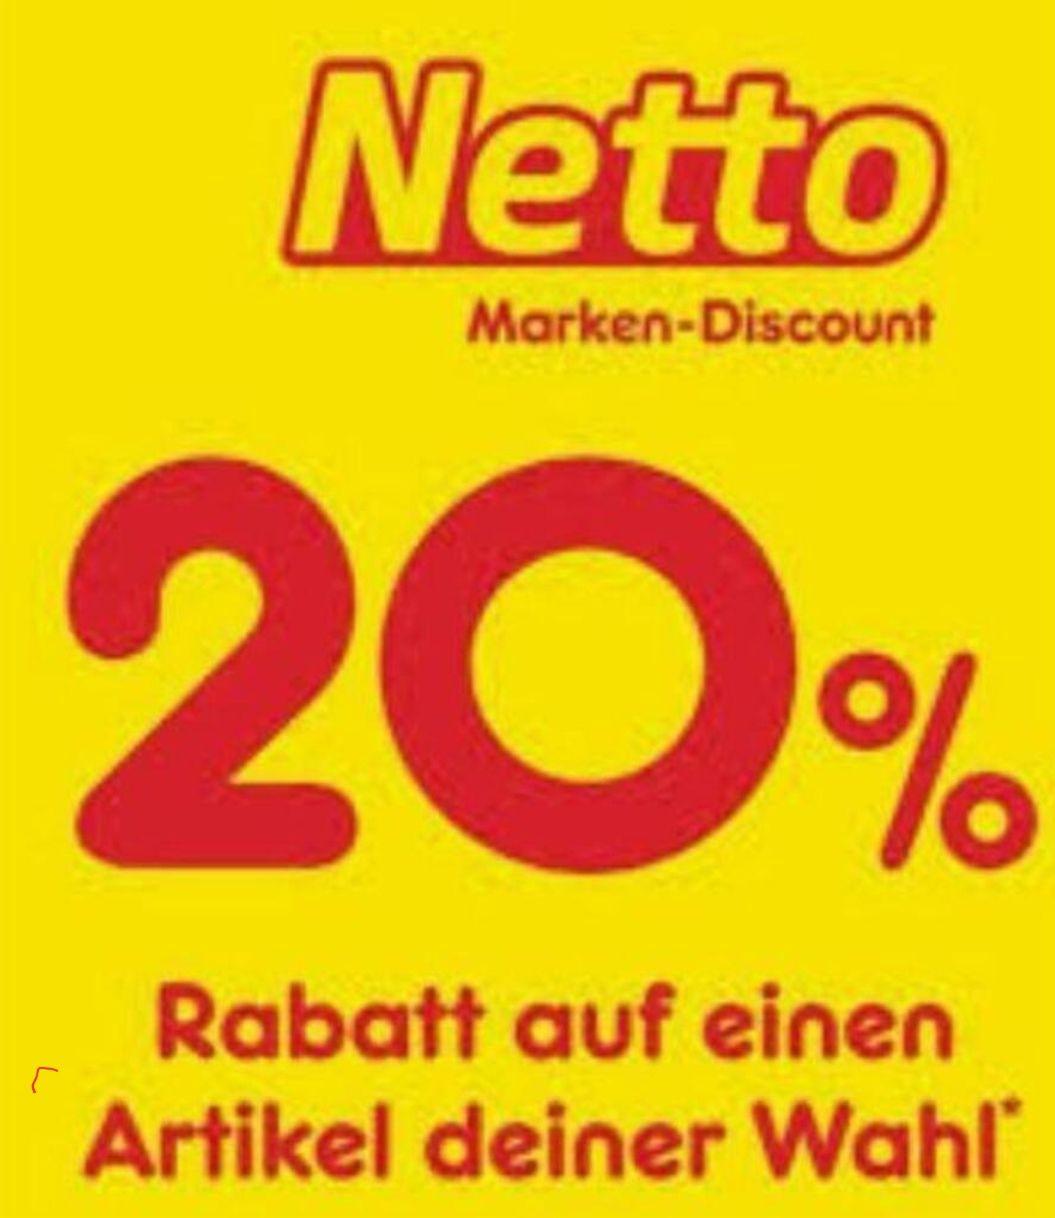 [Netto MD] Rabatt Coupons KW4 (25.01. - 30.01.), bundesweit einsetzbar